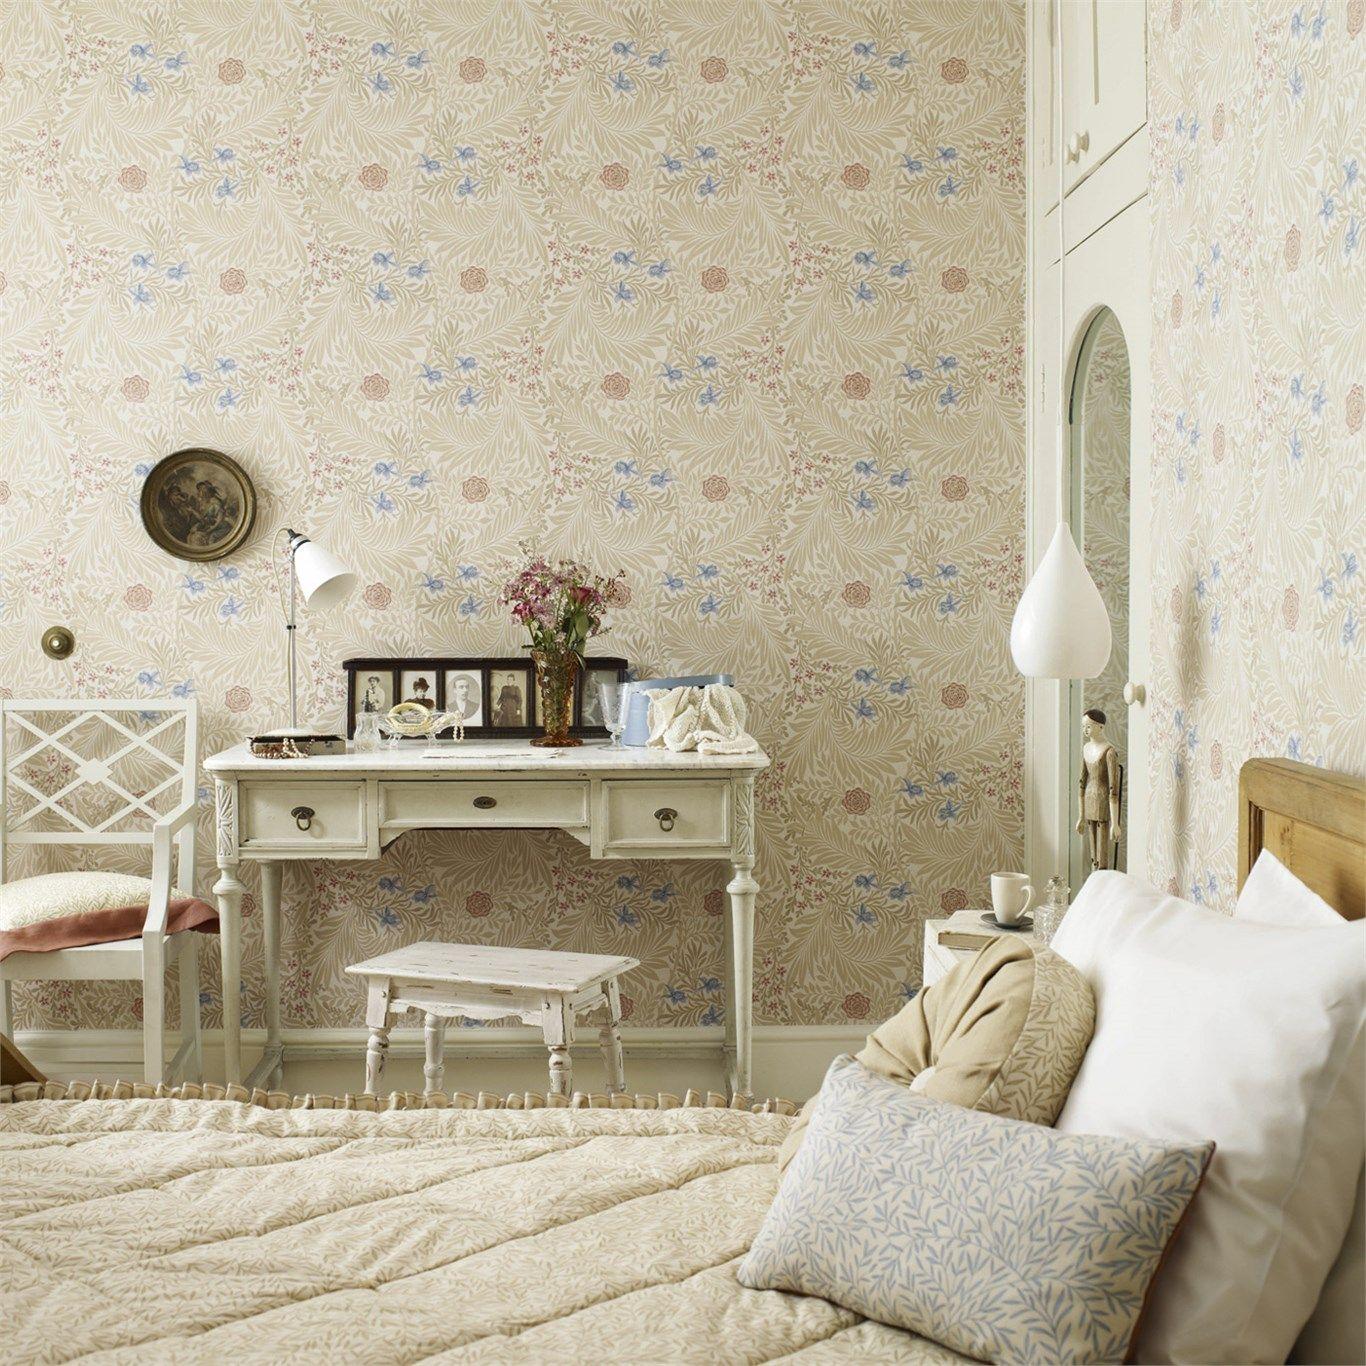 Light Blue Wallpaper Bedroom Larkspur Archive Ii Wallpapers By Morris Co Morris Co